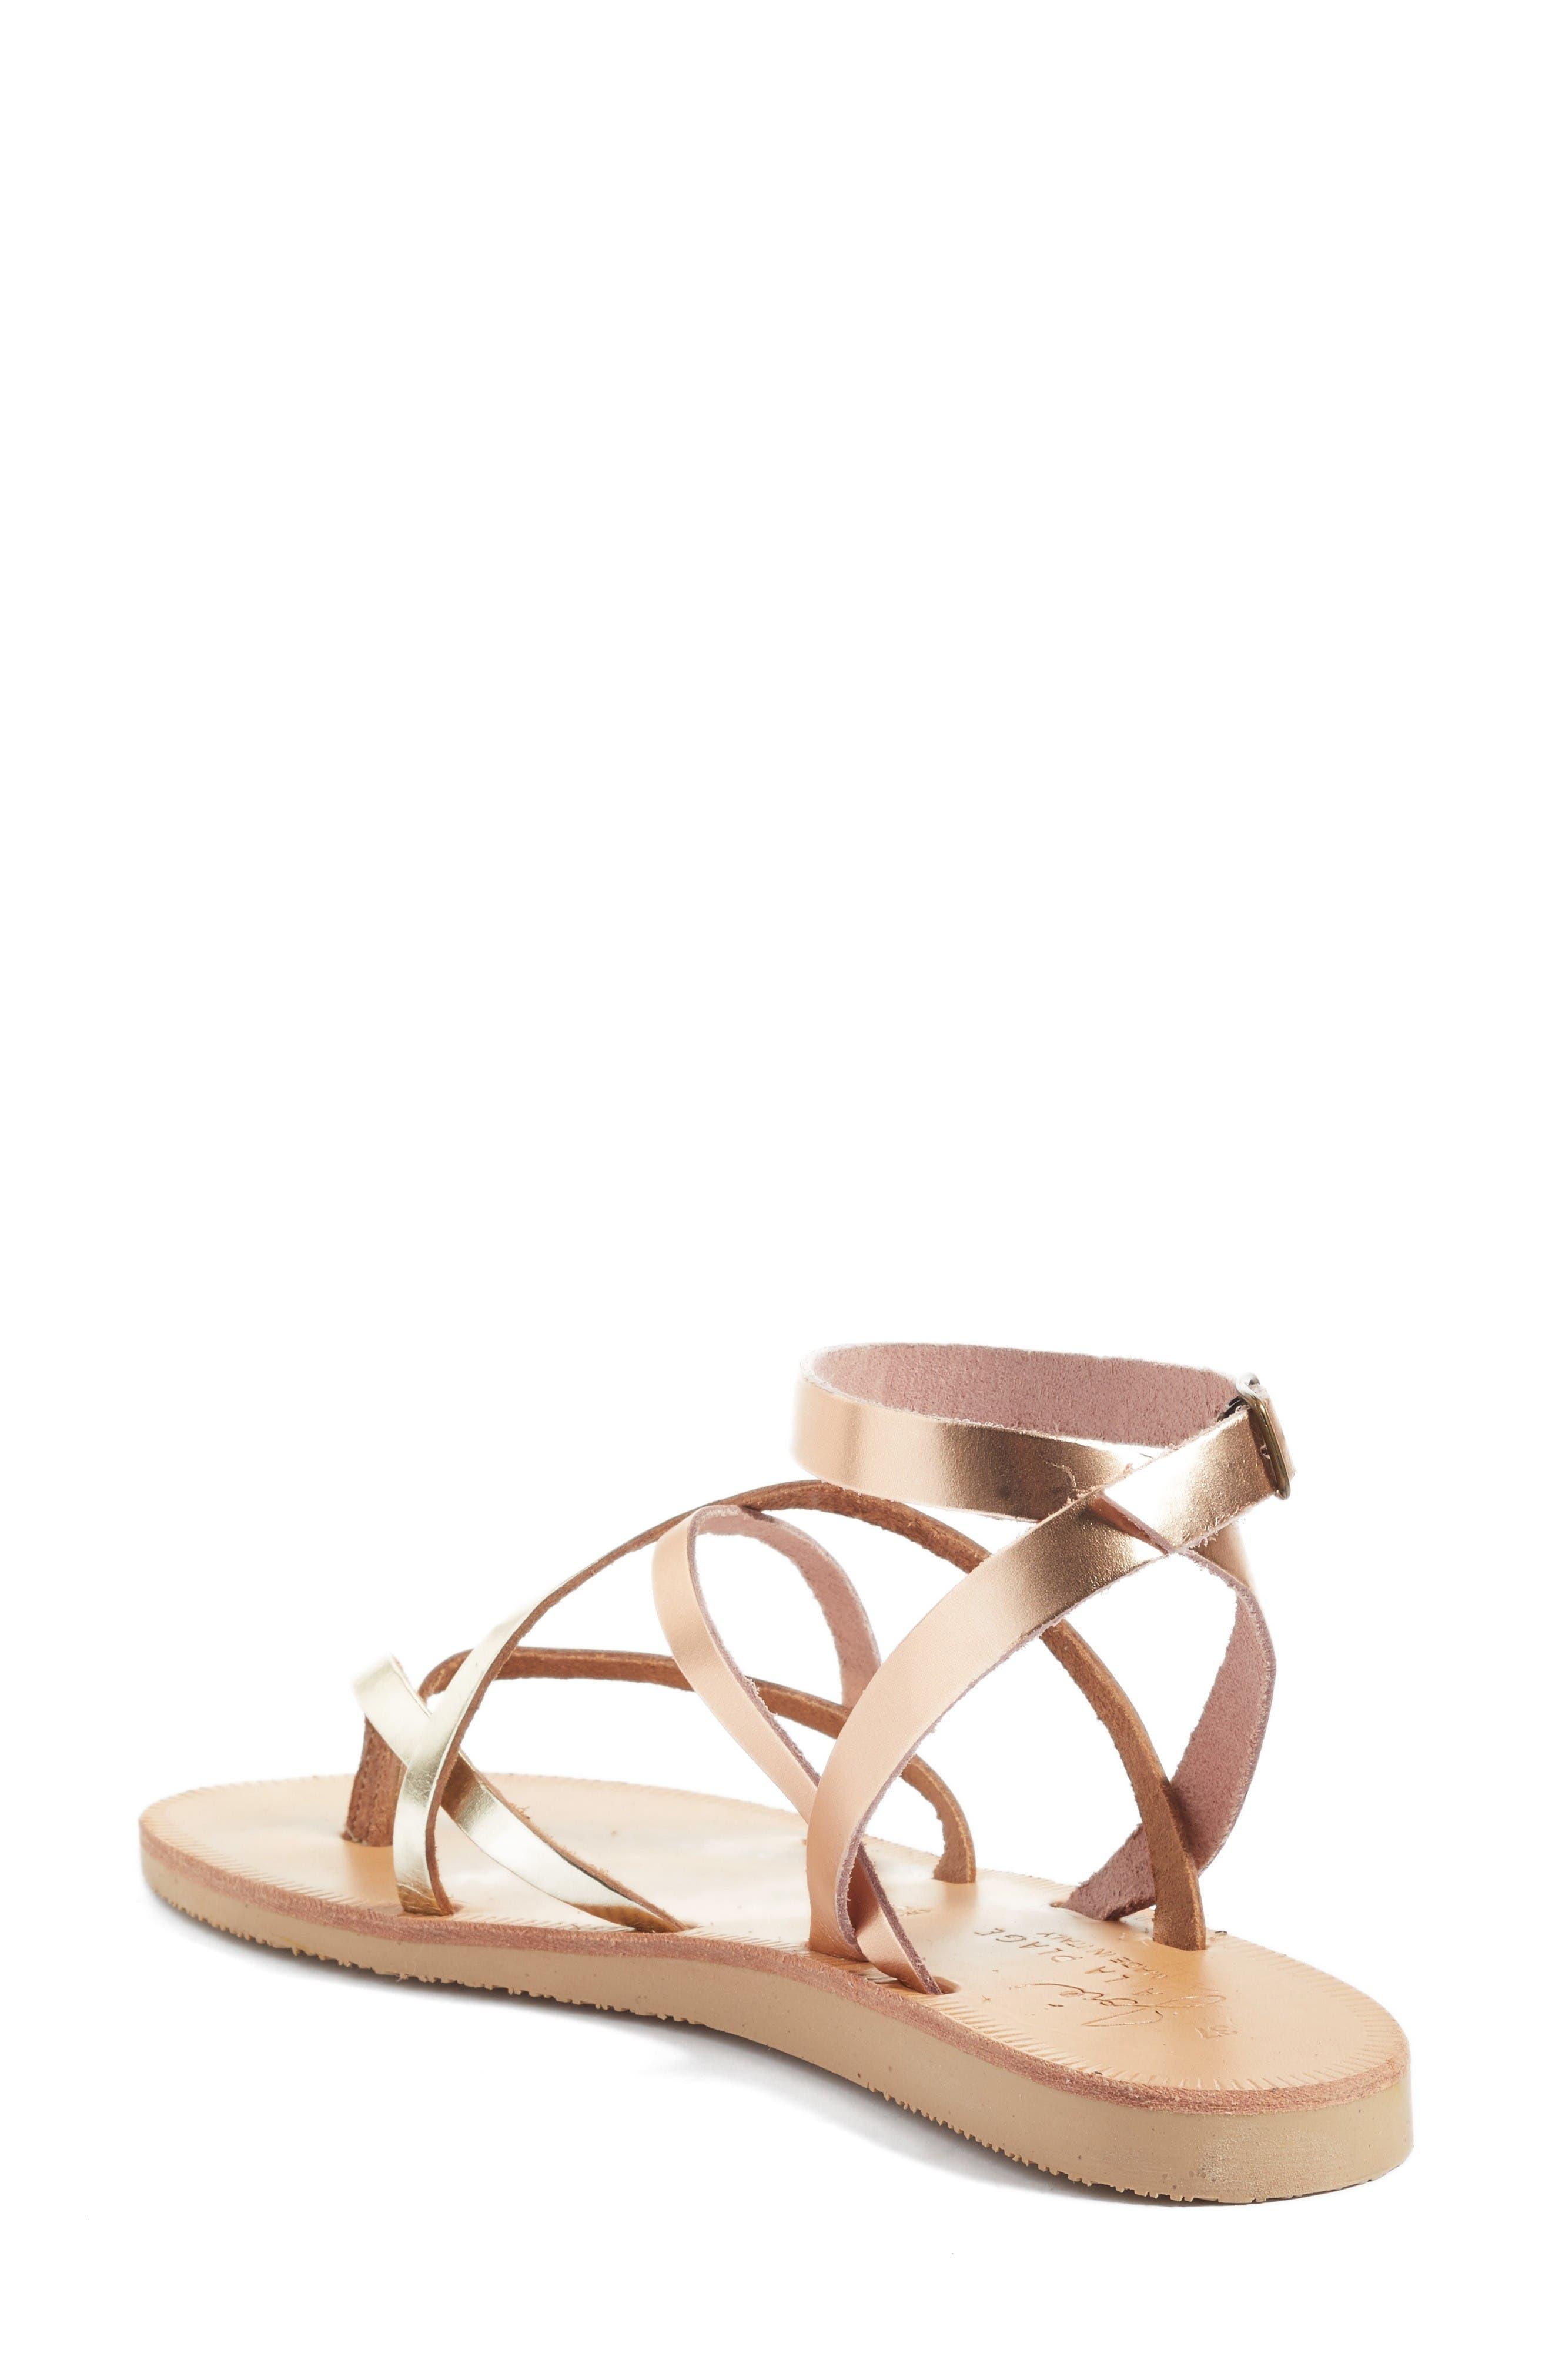 Alternate Image 2  - Joie 'Oda' Flat Sandal (Women)